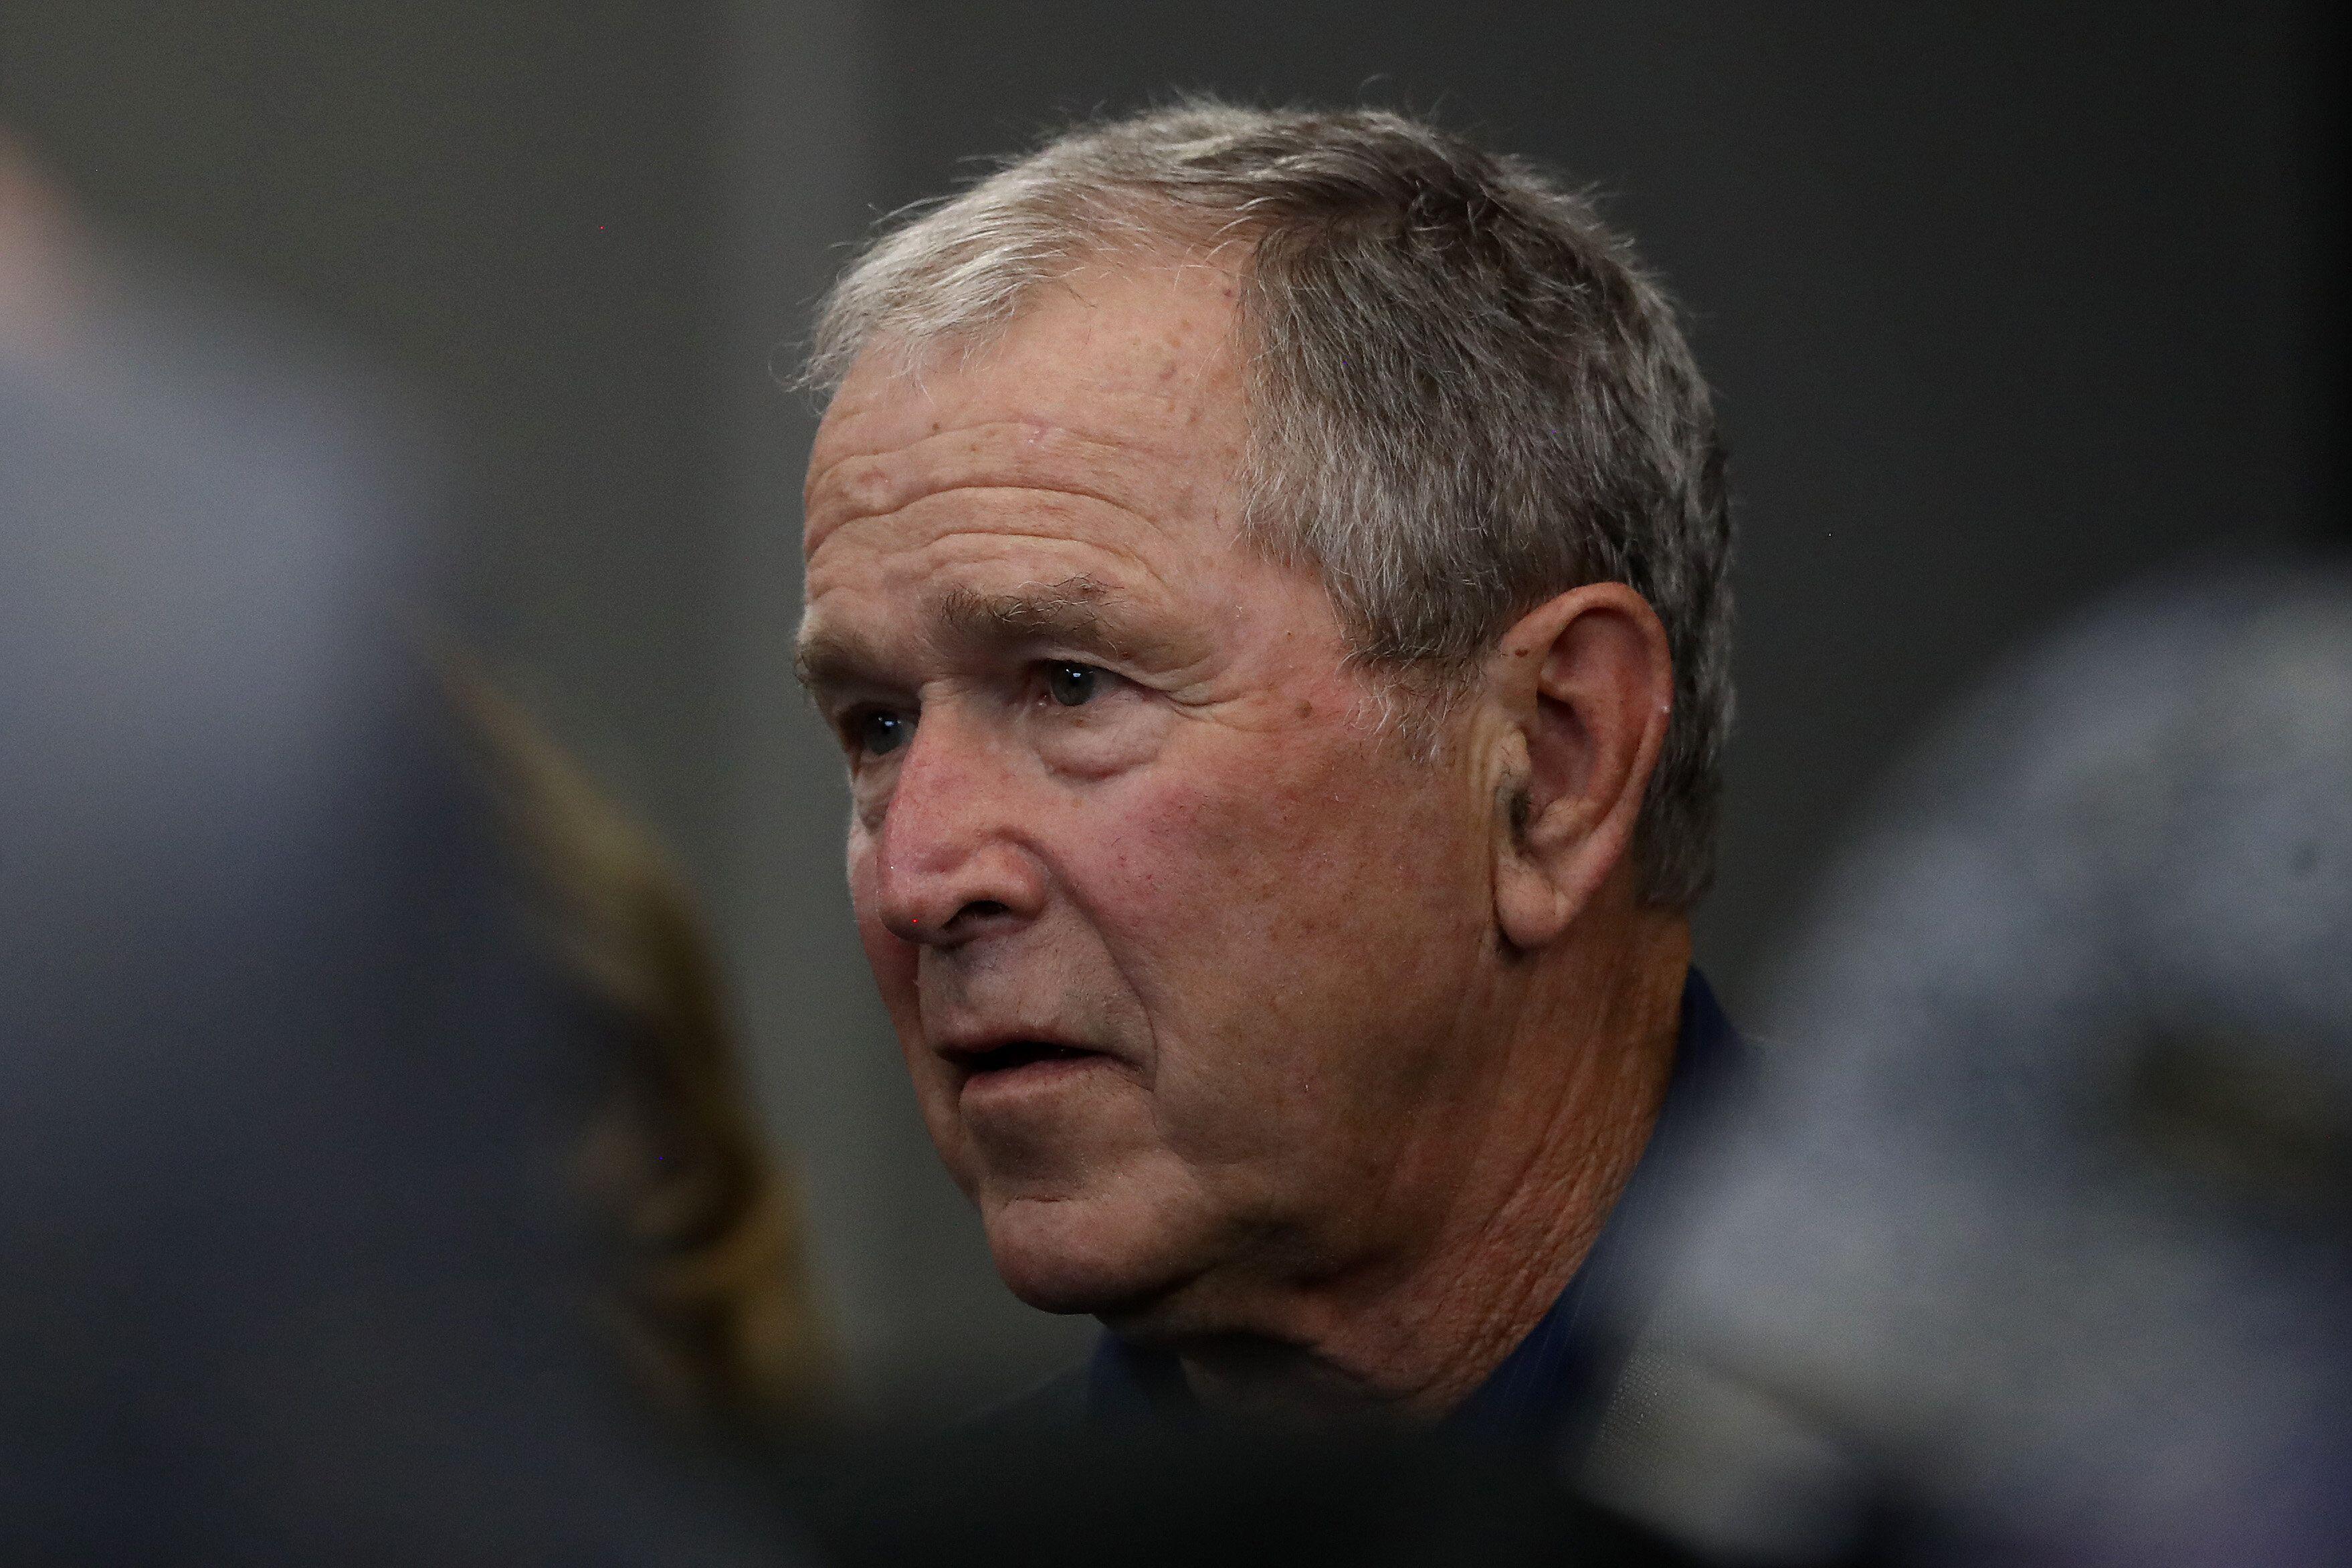 Former President George W. Bush is facing some pressure to endorse the Democratic presidential nominee, Joe Biden.